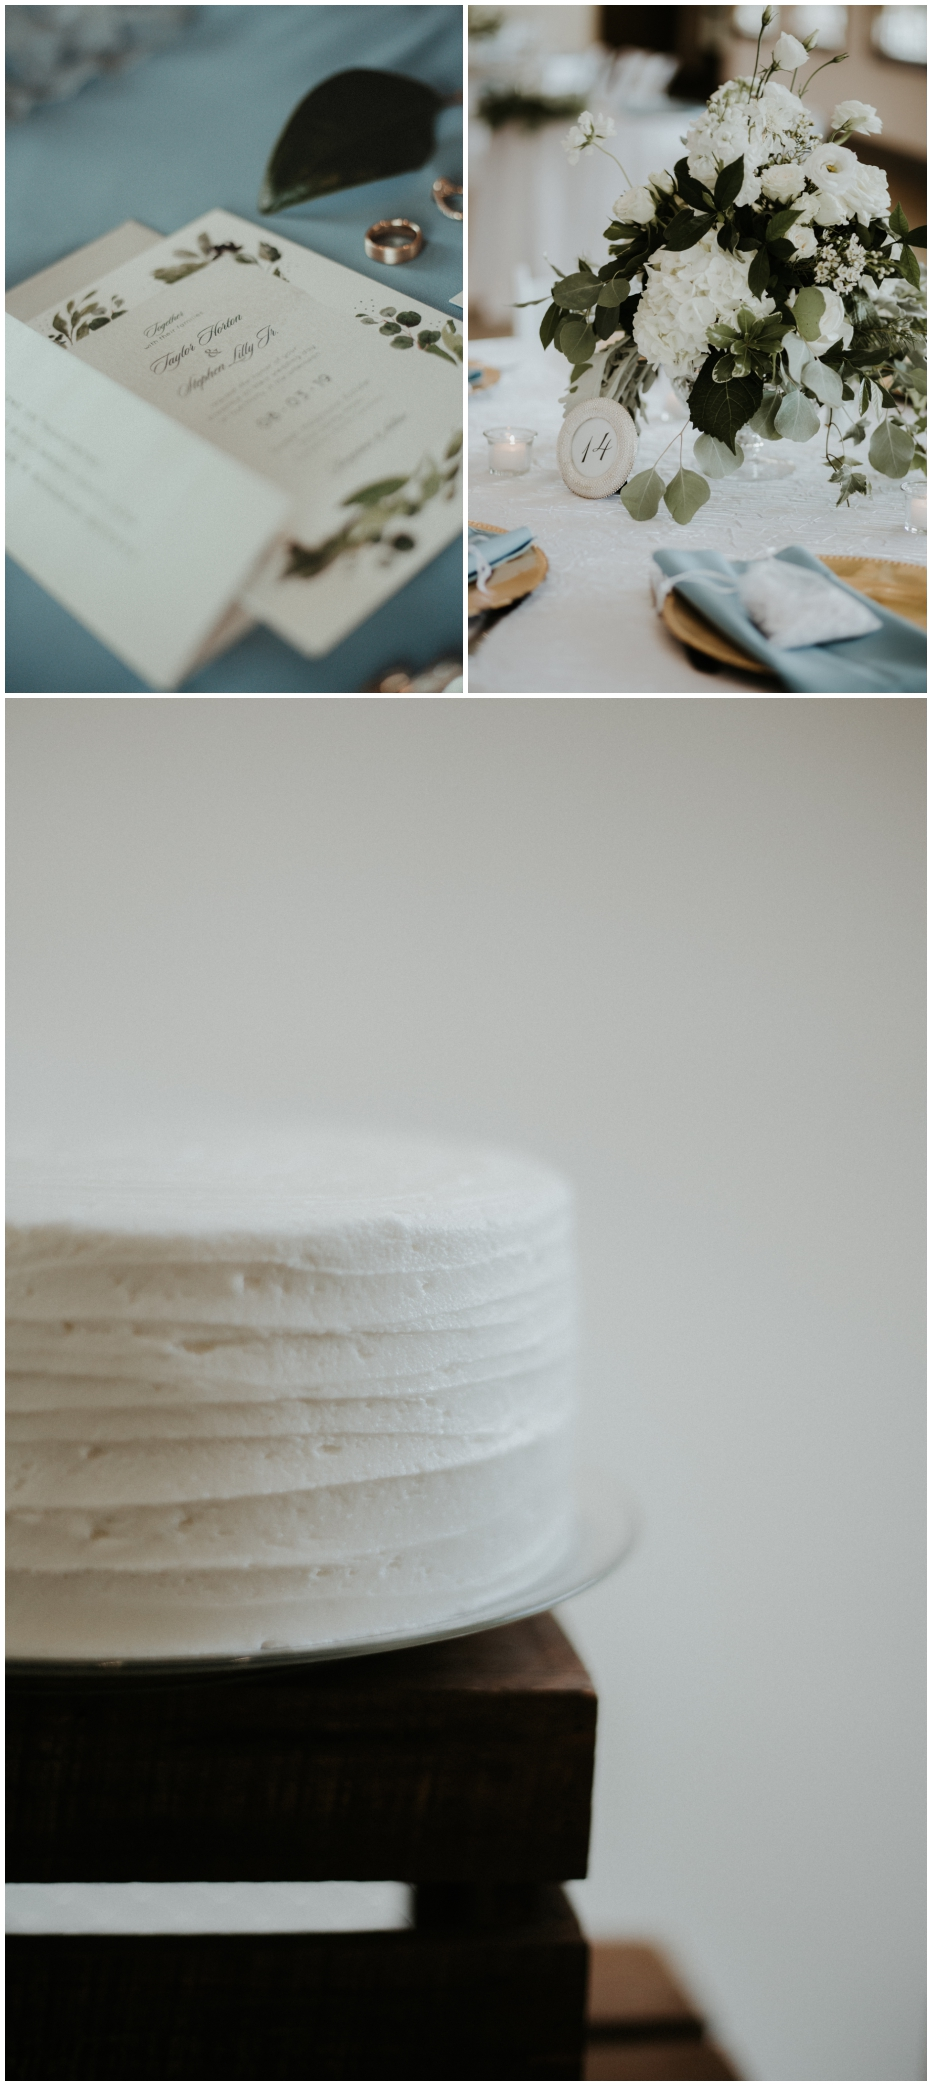 Posh-Moments-Photography-NC- Wedding-Photographer-Rolling-Hills-Farms-Wedding-Monroe-NC-Charlotte-NC_0245.jpg